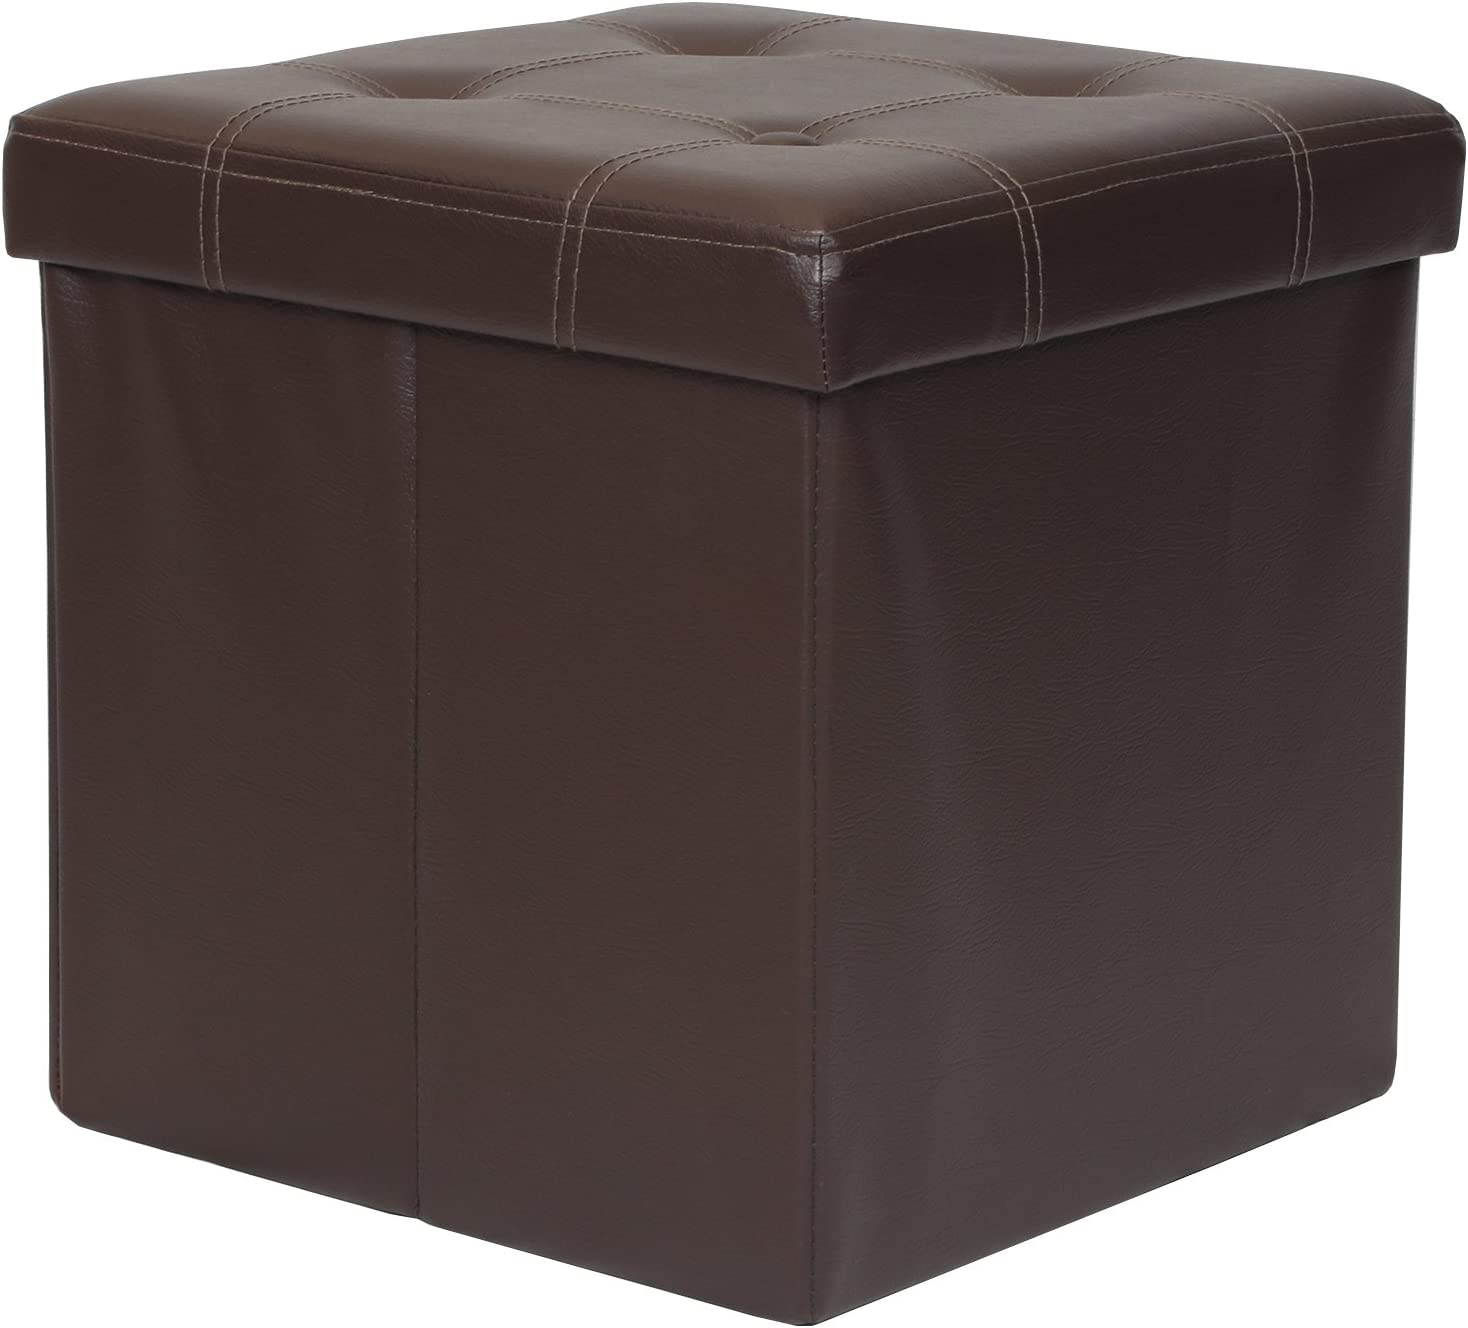 Otto u0026 Ben 15  Storage Ottoman - Folding Toy Box Chest Memory Foam Seat  sc 1 st  Amazon.com & Ottomans u0026 Storage Ottomans | Amazon.com